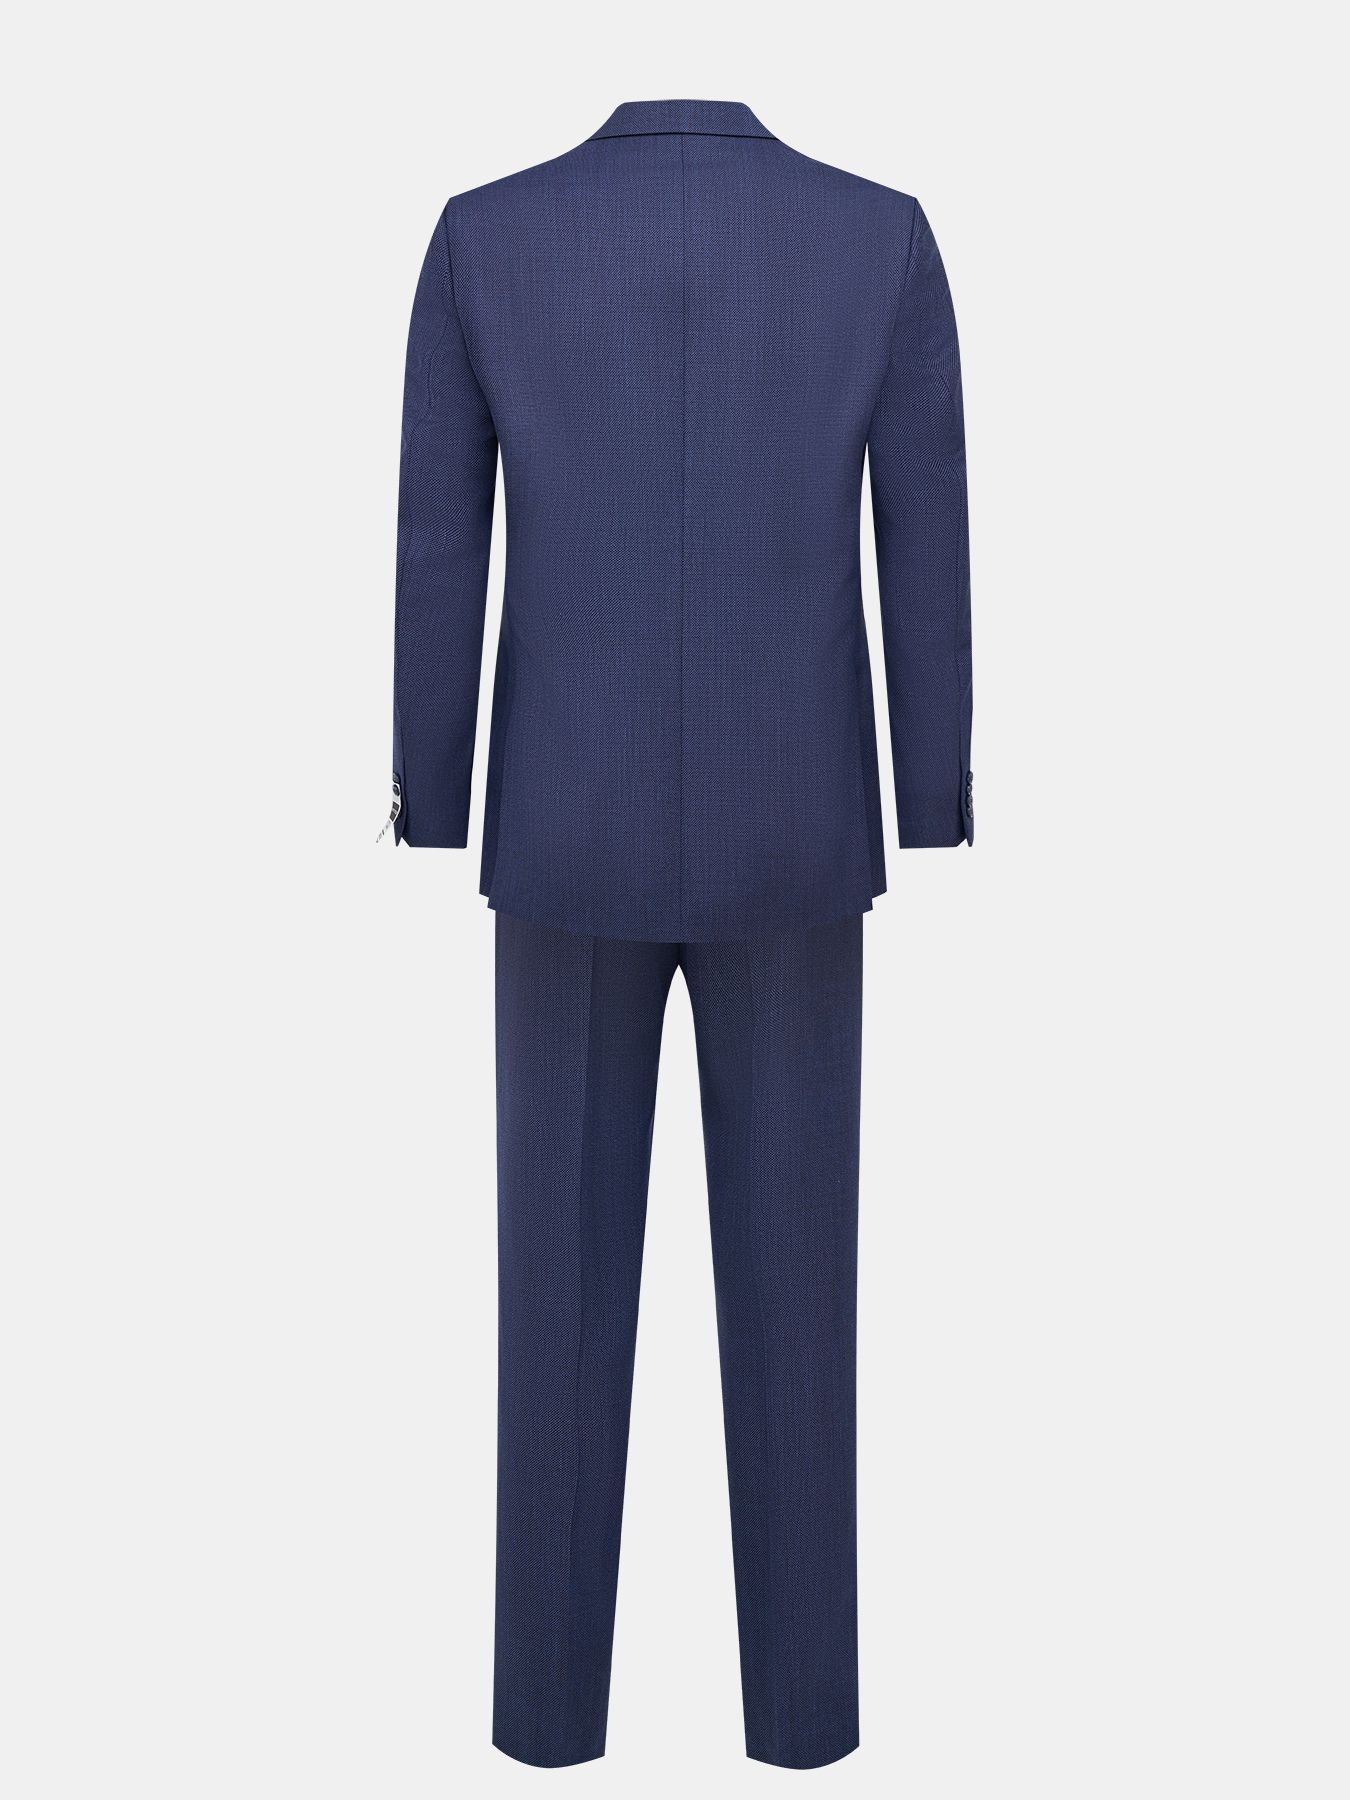 aspesi design by lawrence steele классический костюм Костюм Ritter Классический костюм